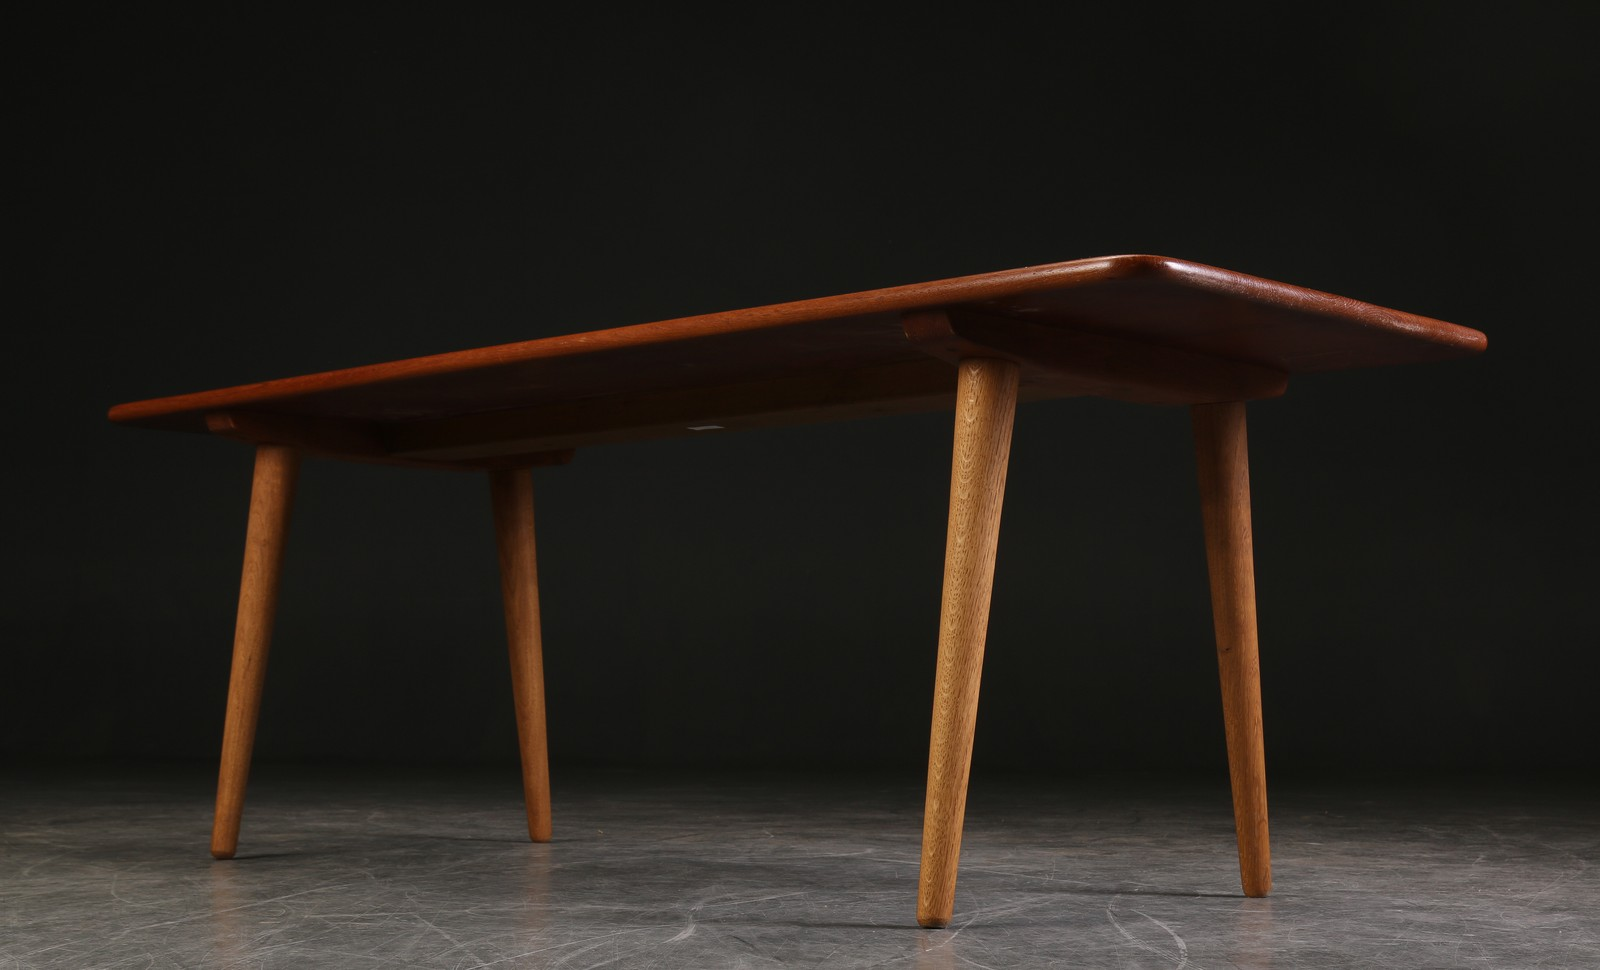 Sofa table AT-11 by Hans Wegner